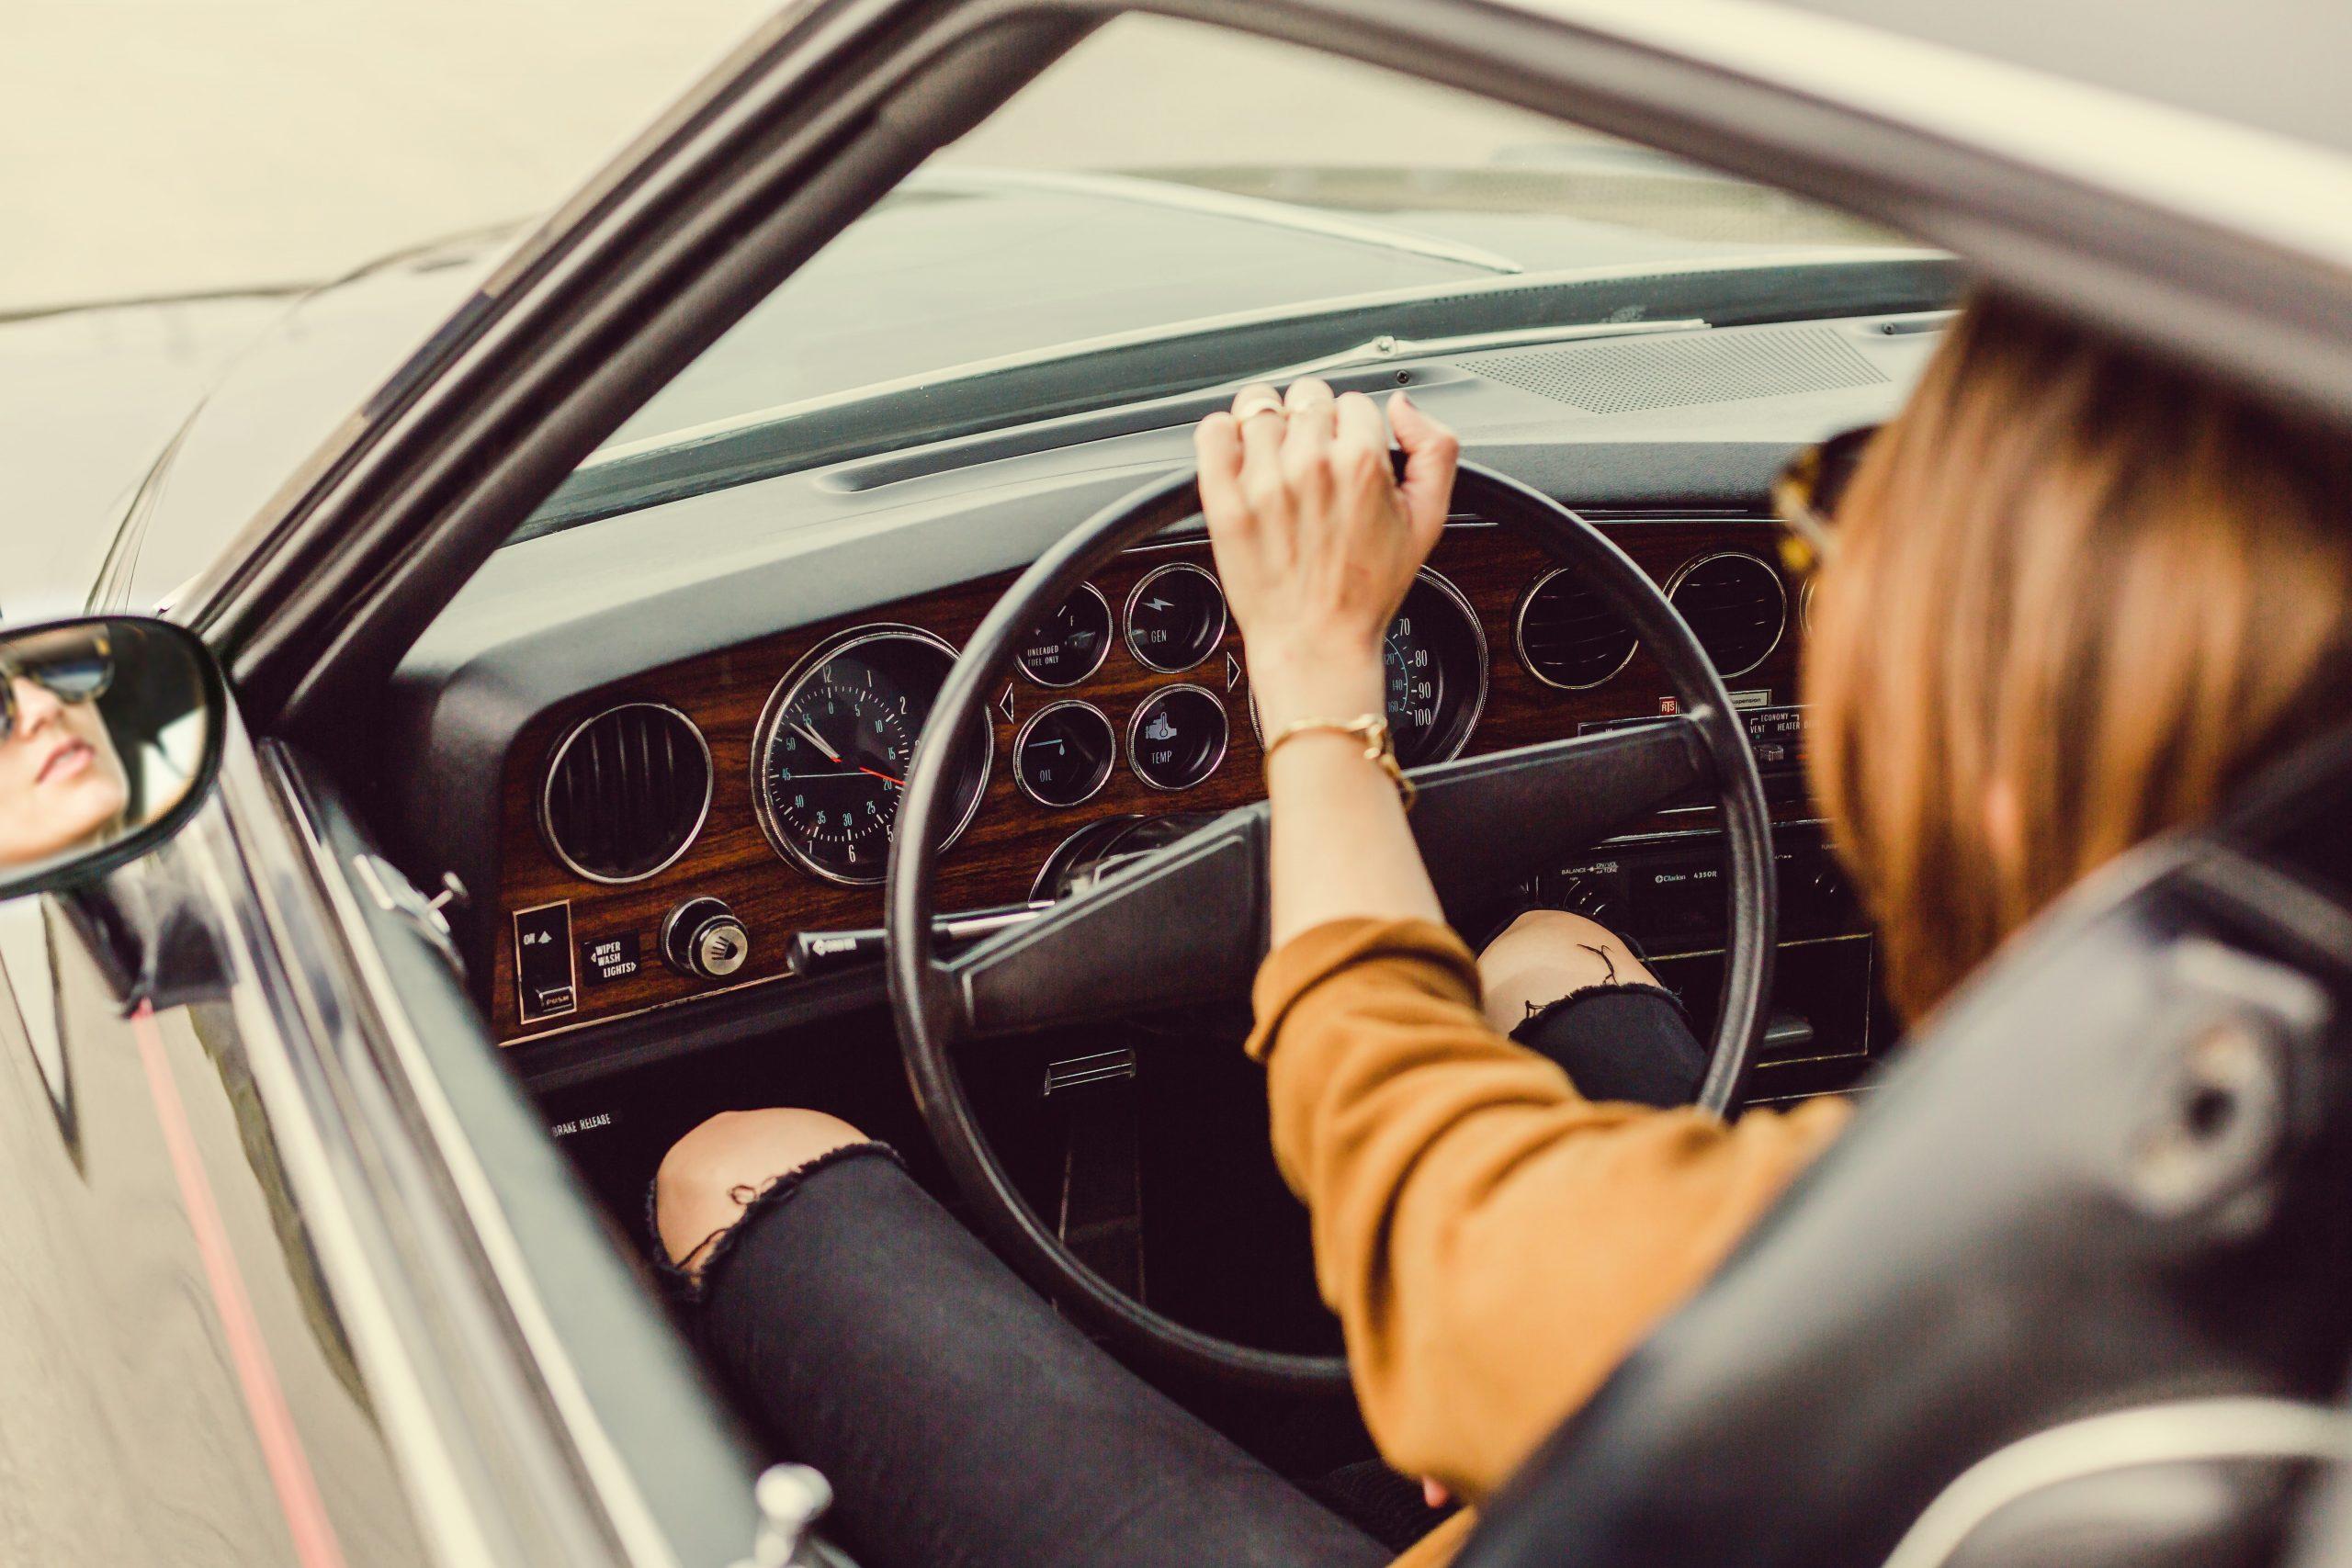 bilvard-bilkop-allt-for-nyborjaren